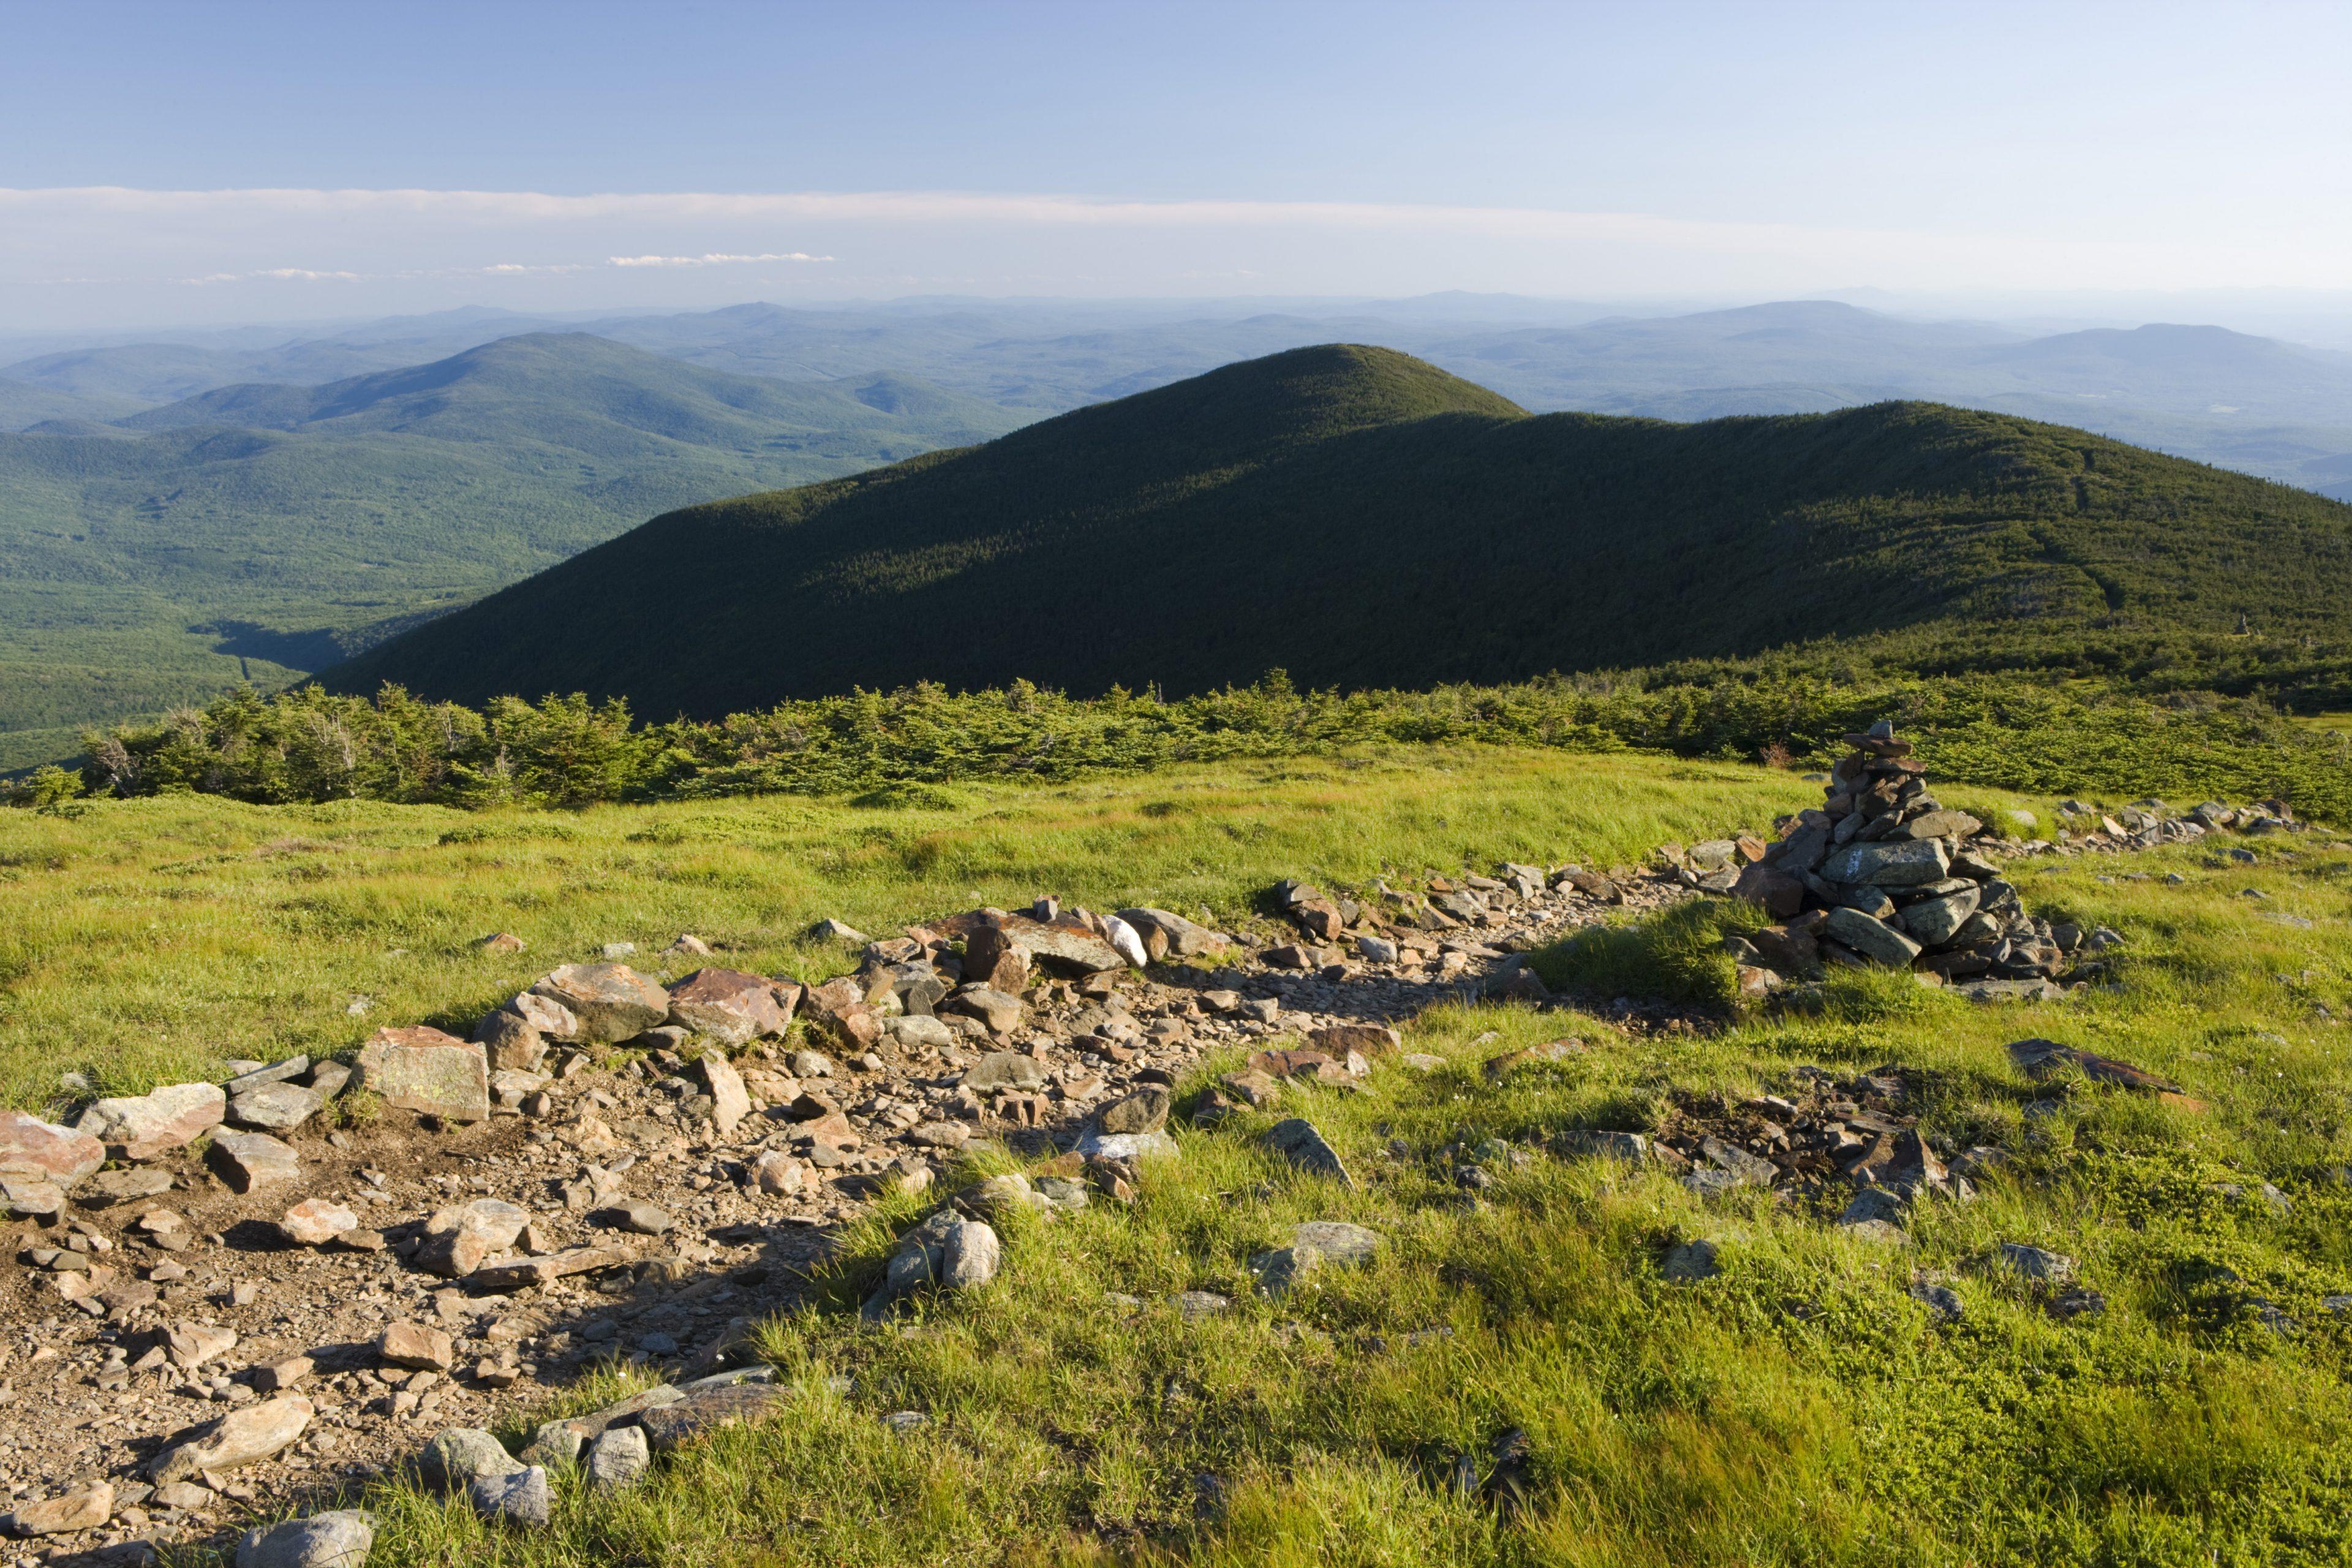 Mount Moosilauke in New Hampshire's White Mountains